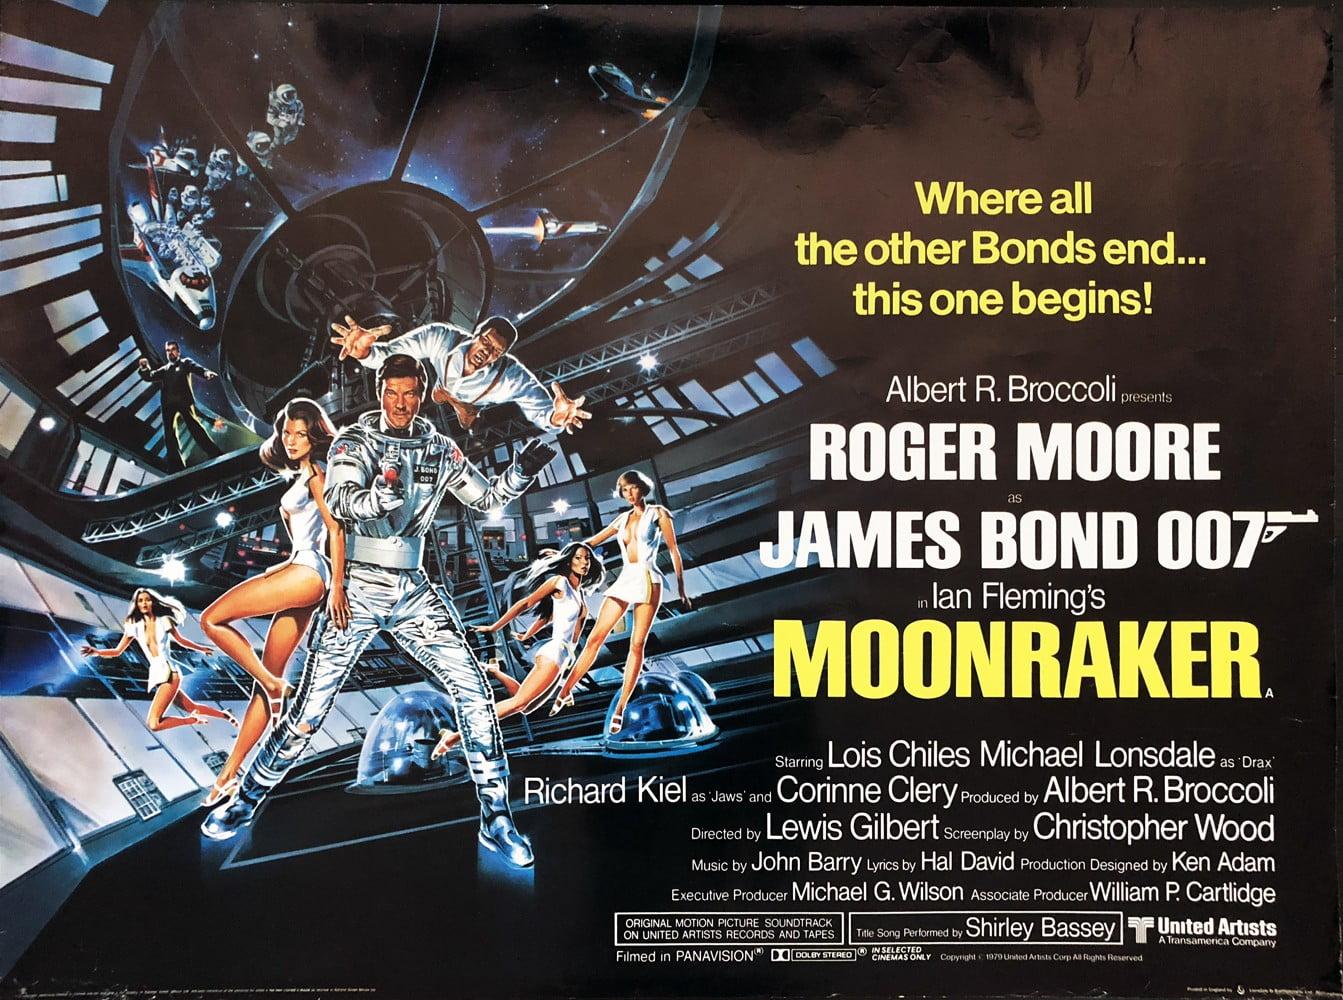 Moonraker22